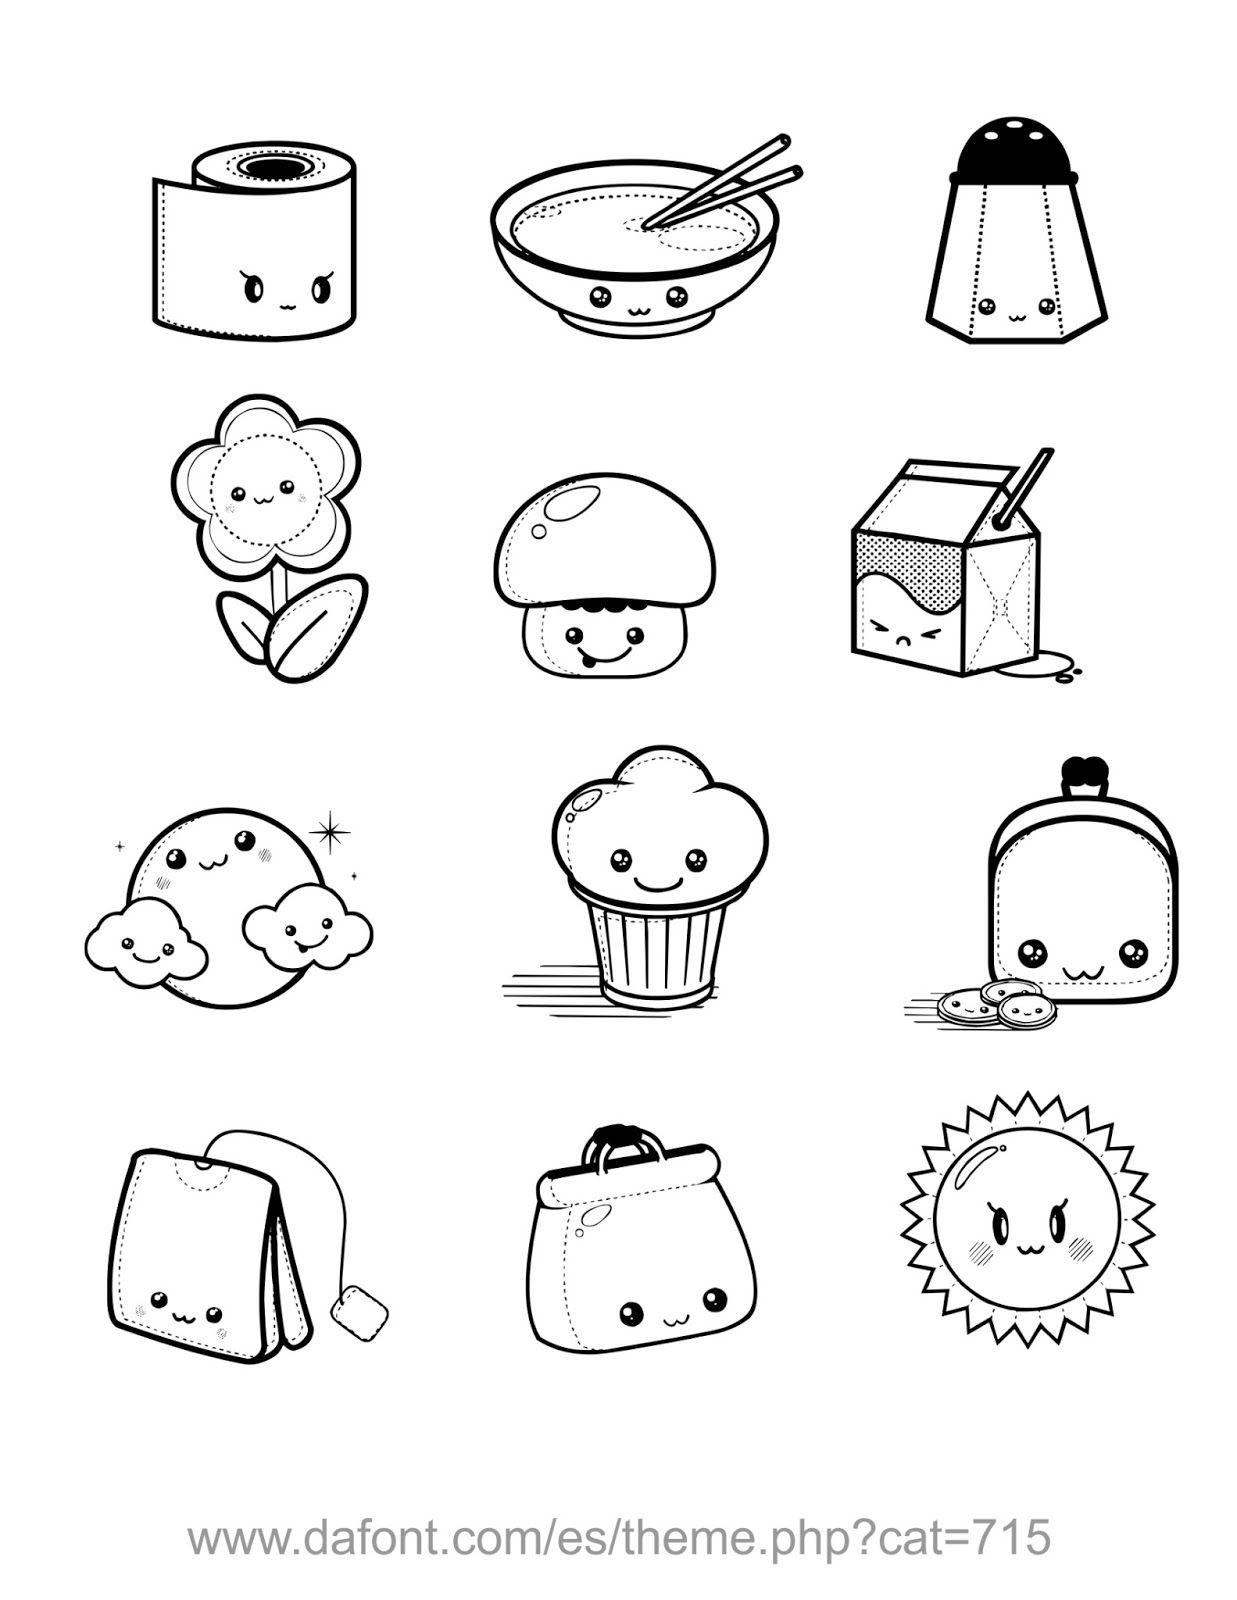 Biblia Ideas: Ilustraciones Dibujos Comida | Dibujos | Pinterest ...